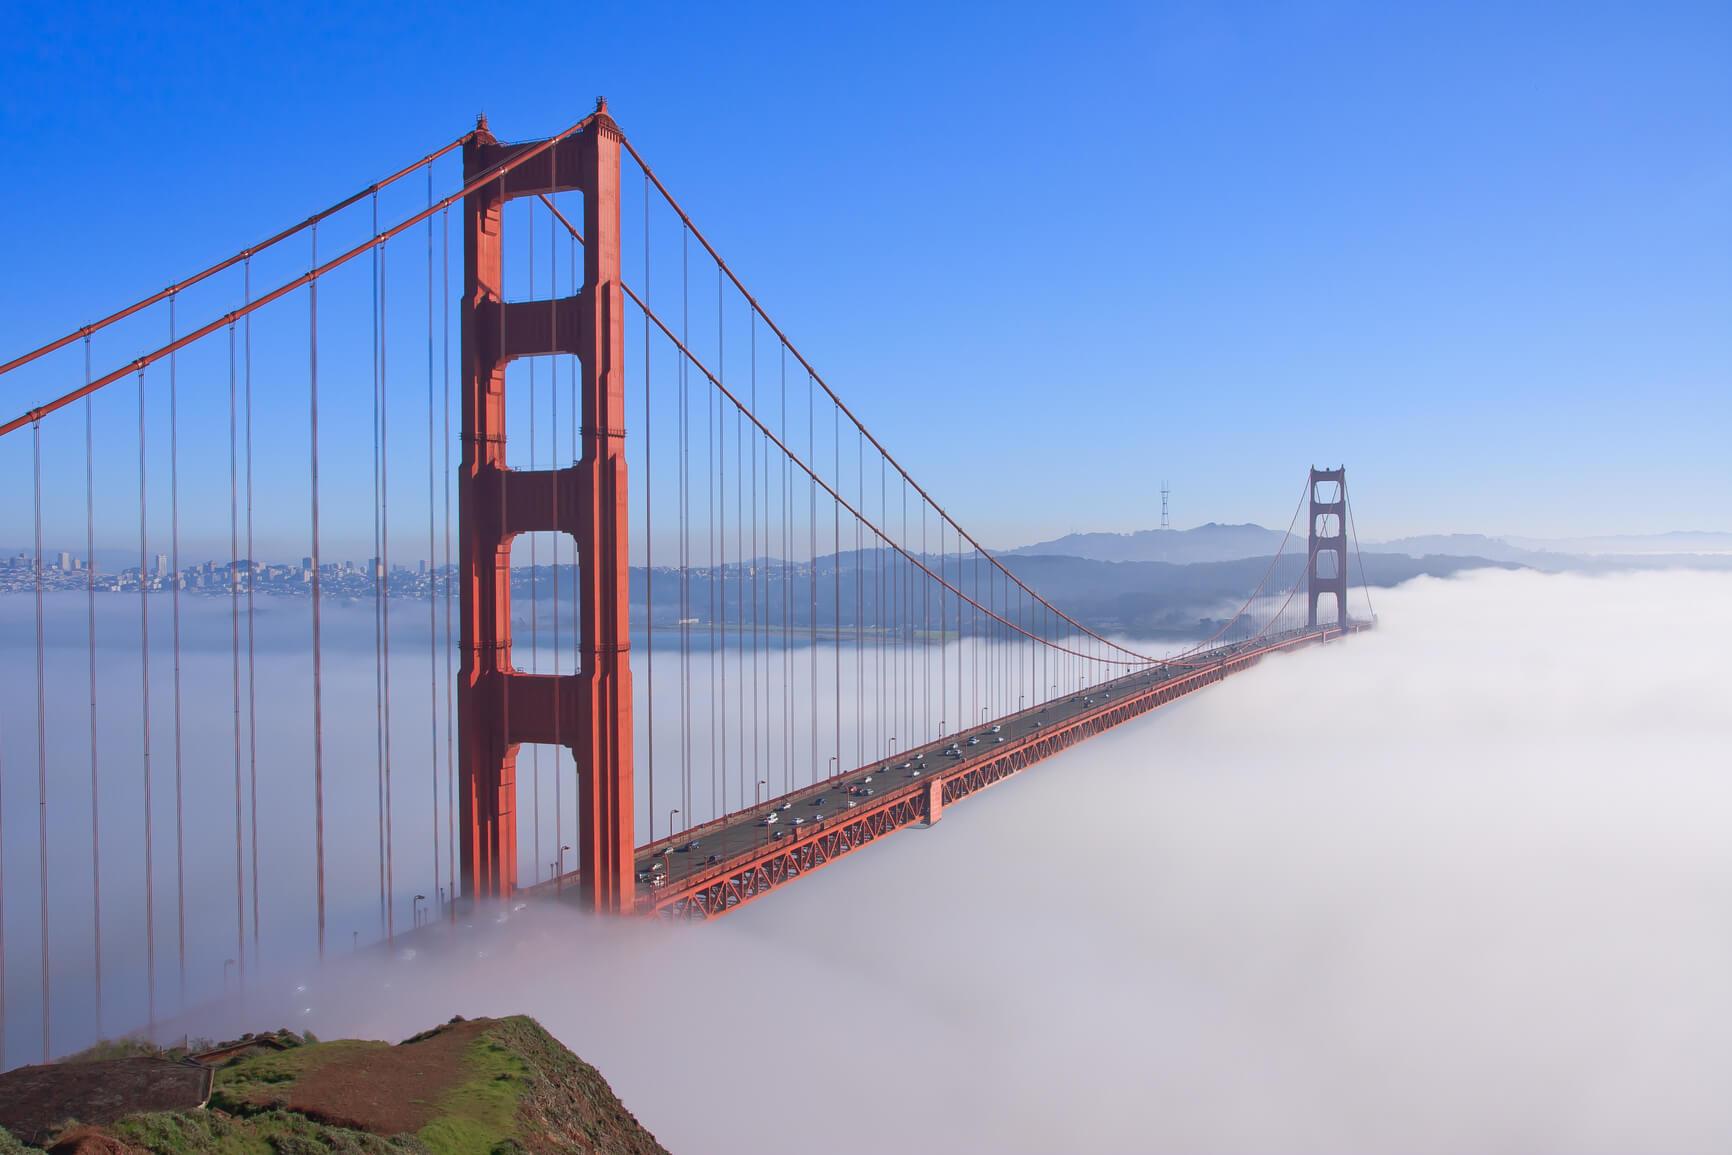 XMAS & NEW YEAR: Cairo, Egypt to San Francisco, USA for only $691 USD roundtrip (Nov-Jul dates)